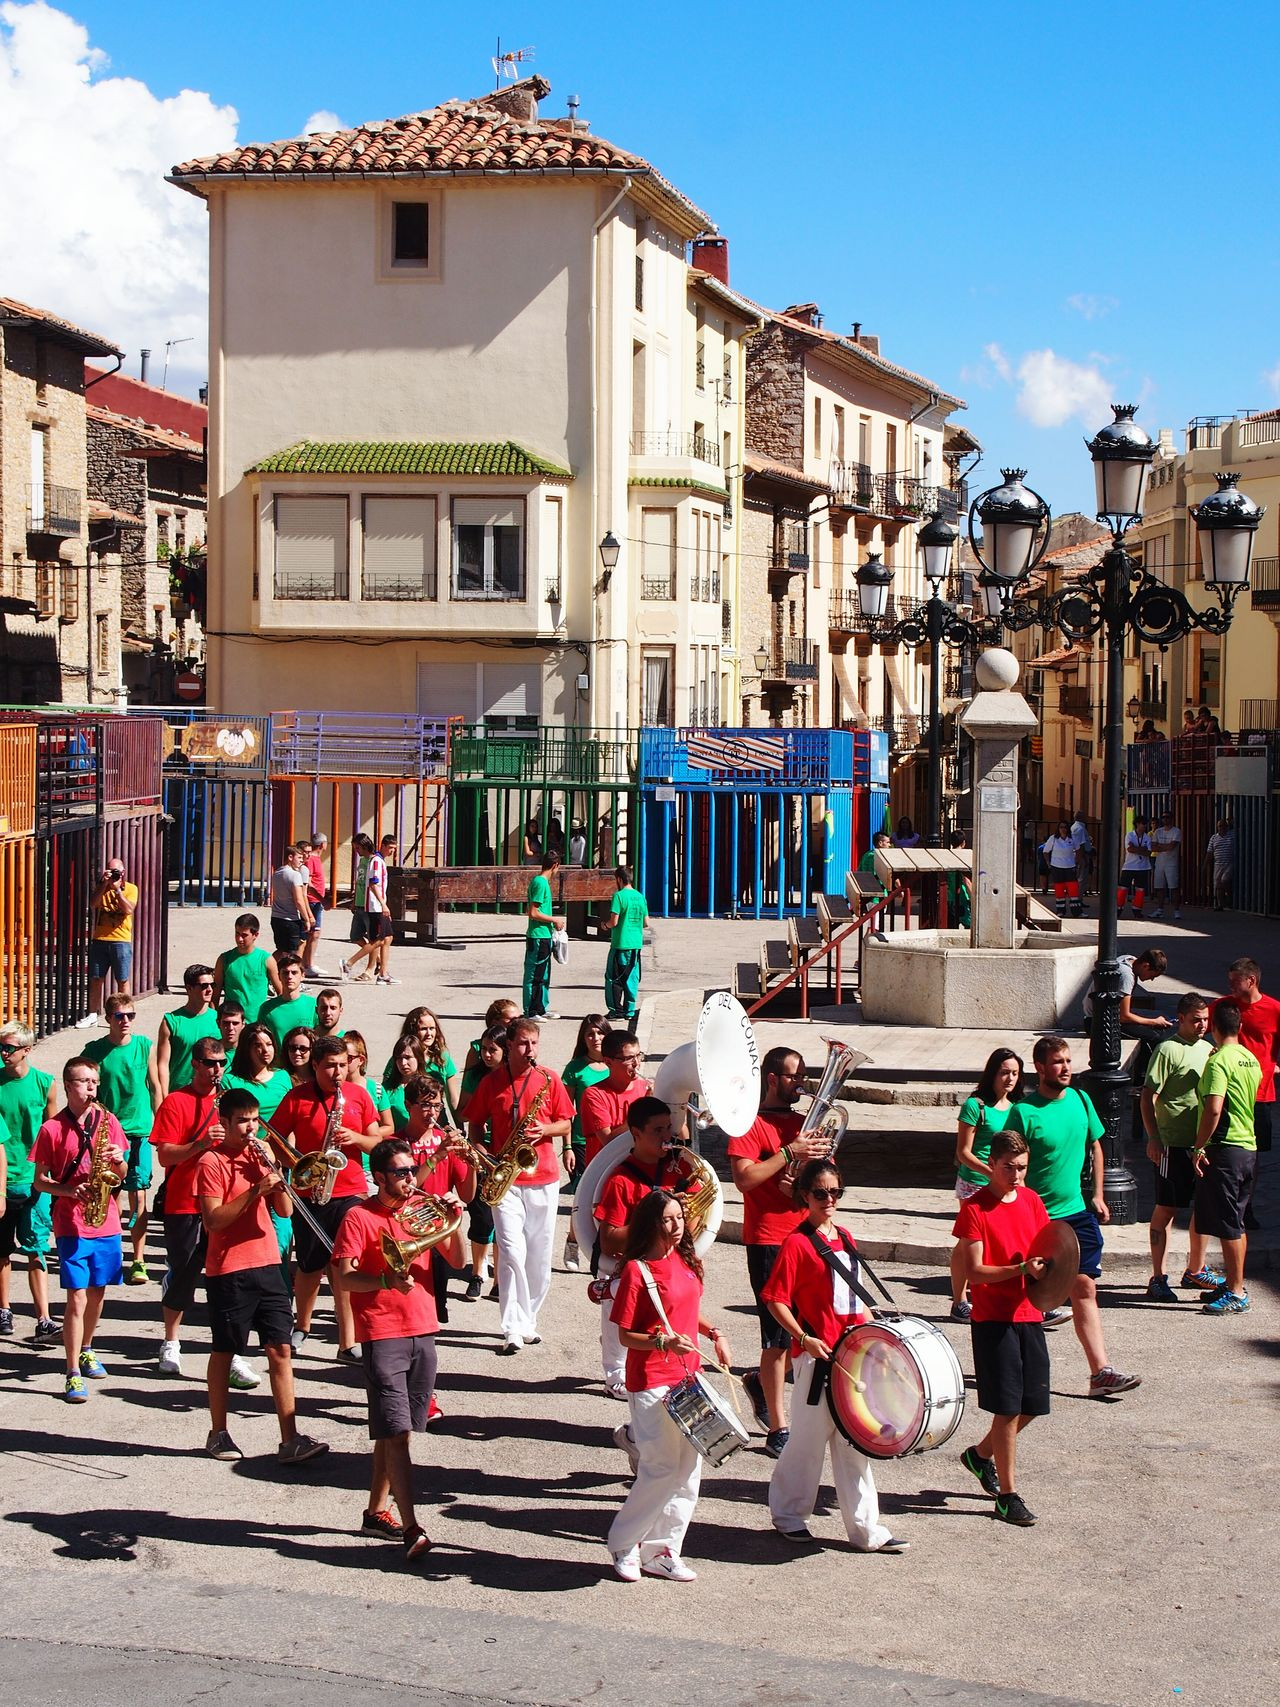 Teruel SPAIN Pueblos People Photography Photography Fiestas Traditions Eye4photography  Photooftheday Pueblos De España The Street Photographer - 2016 EyeEm Awards Girl Power